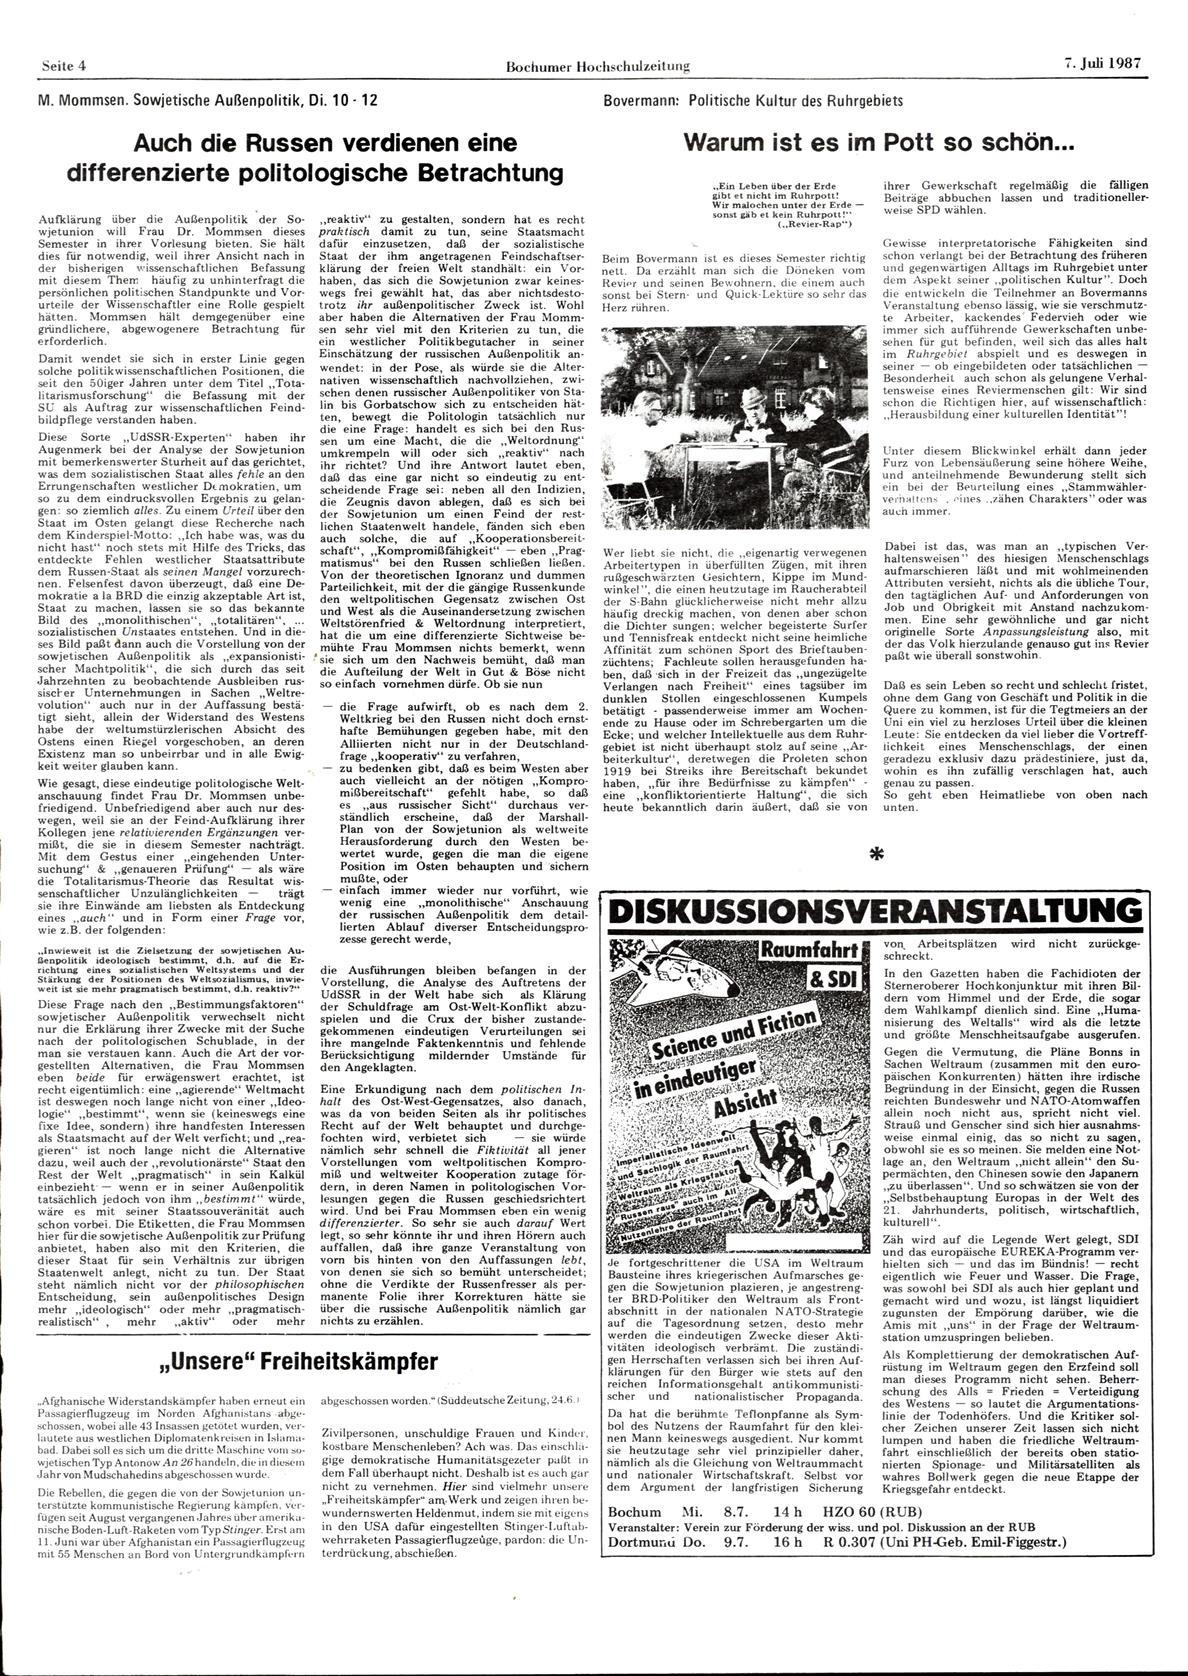 Bochum_BHZ_19870707_153_004